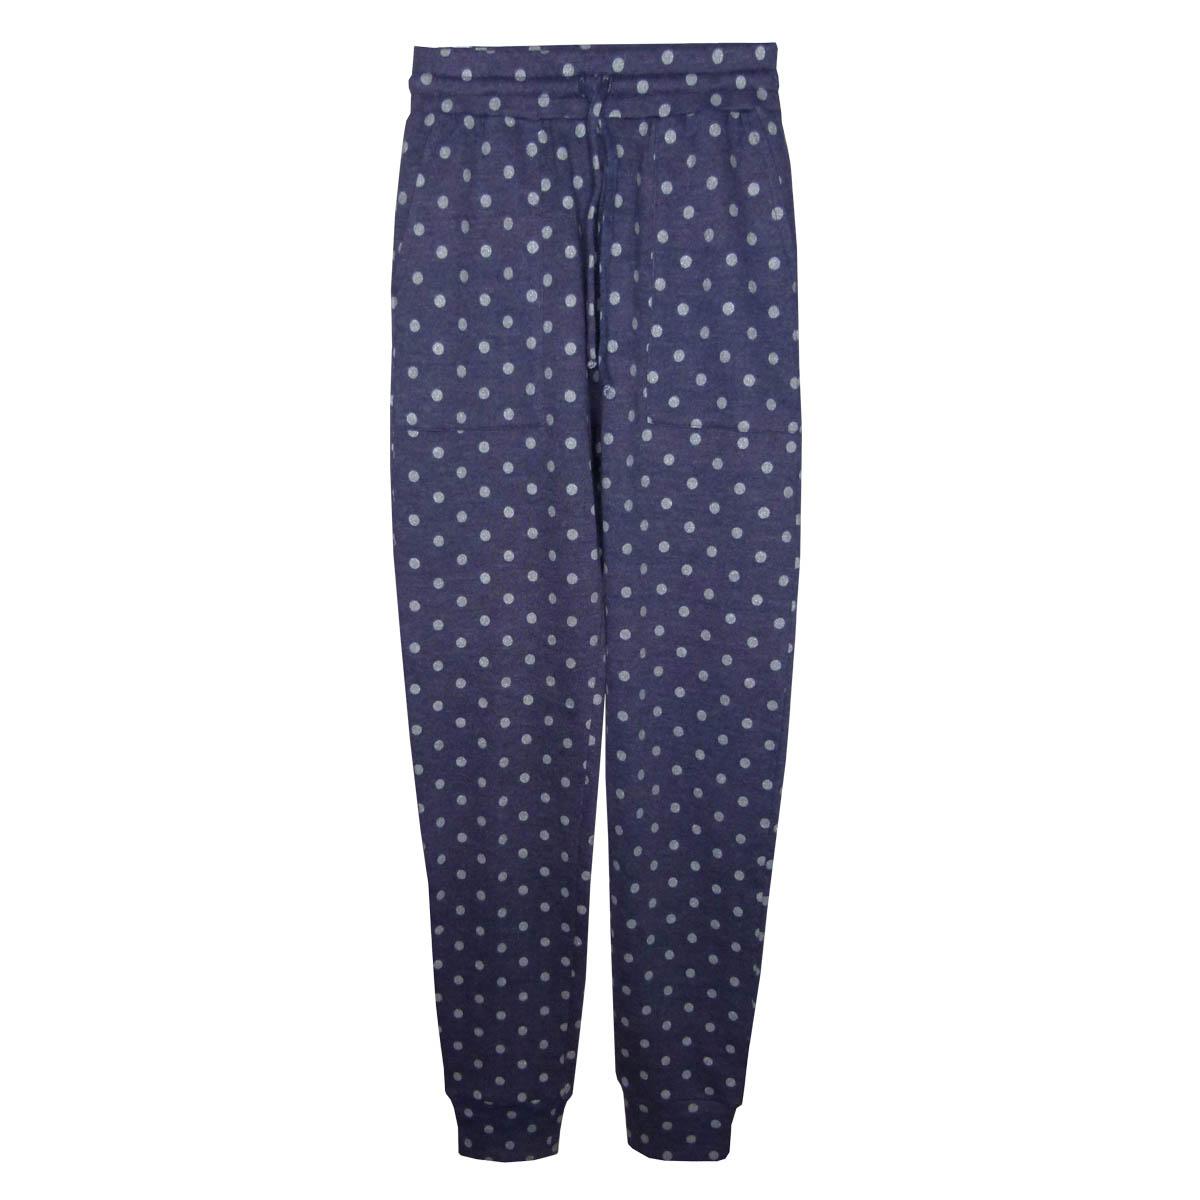 Clothing - Polka Dot Joggers - Blue - 01